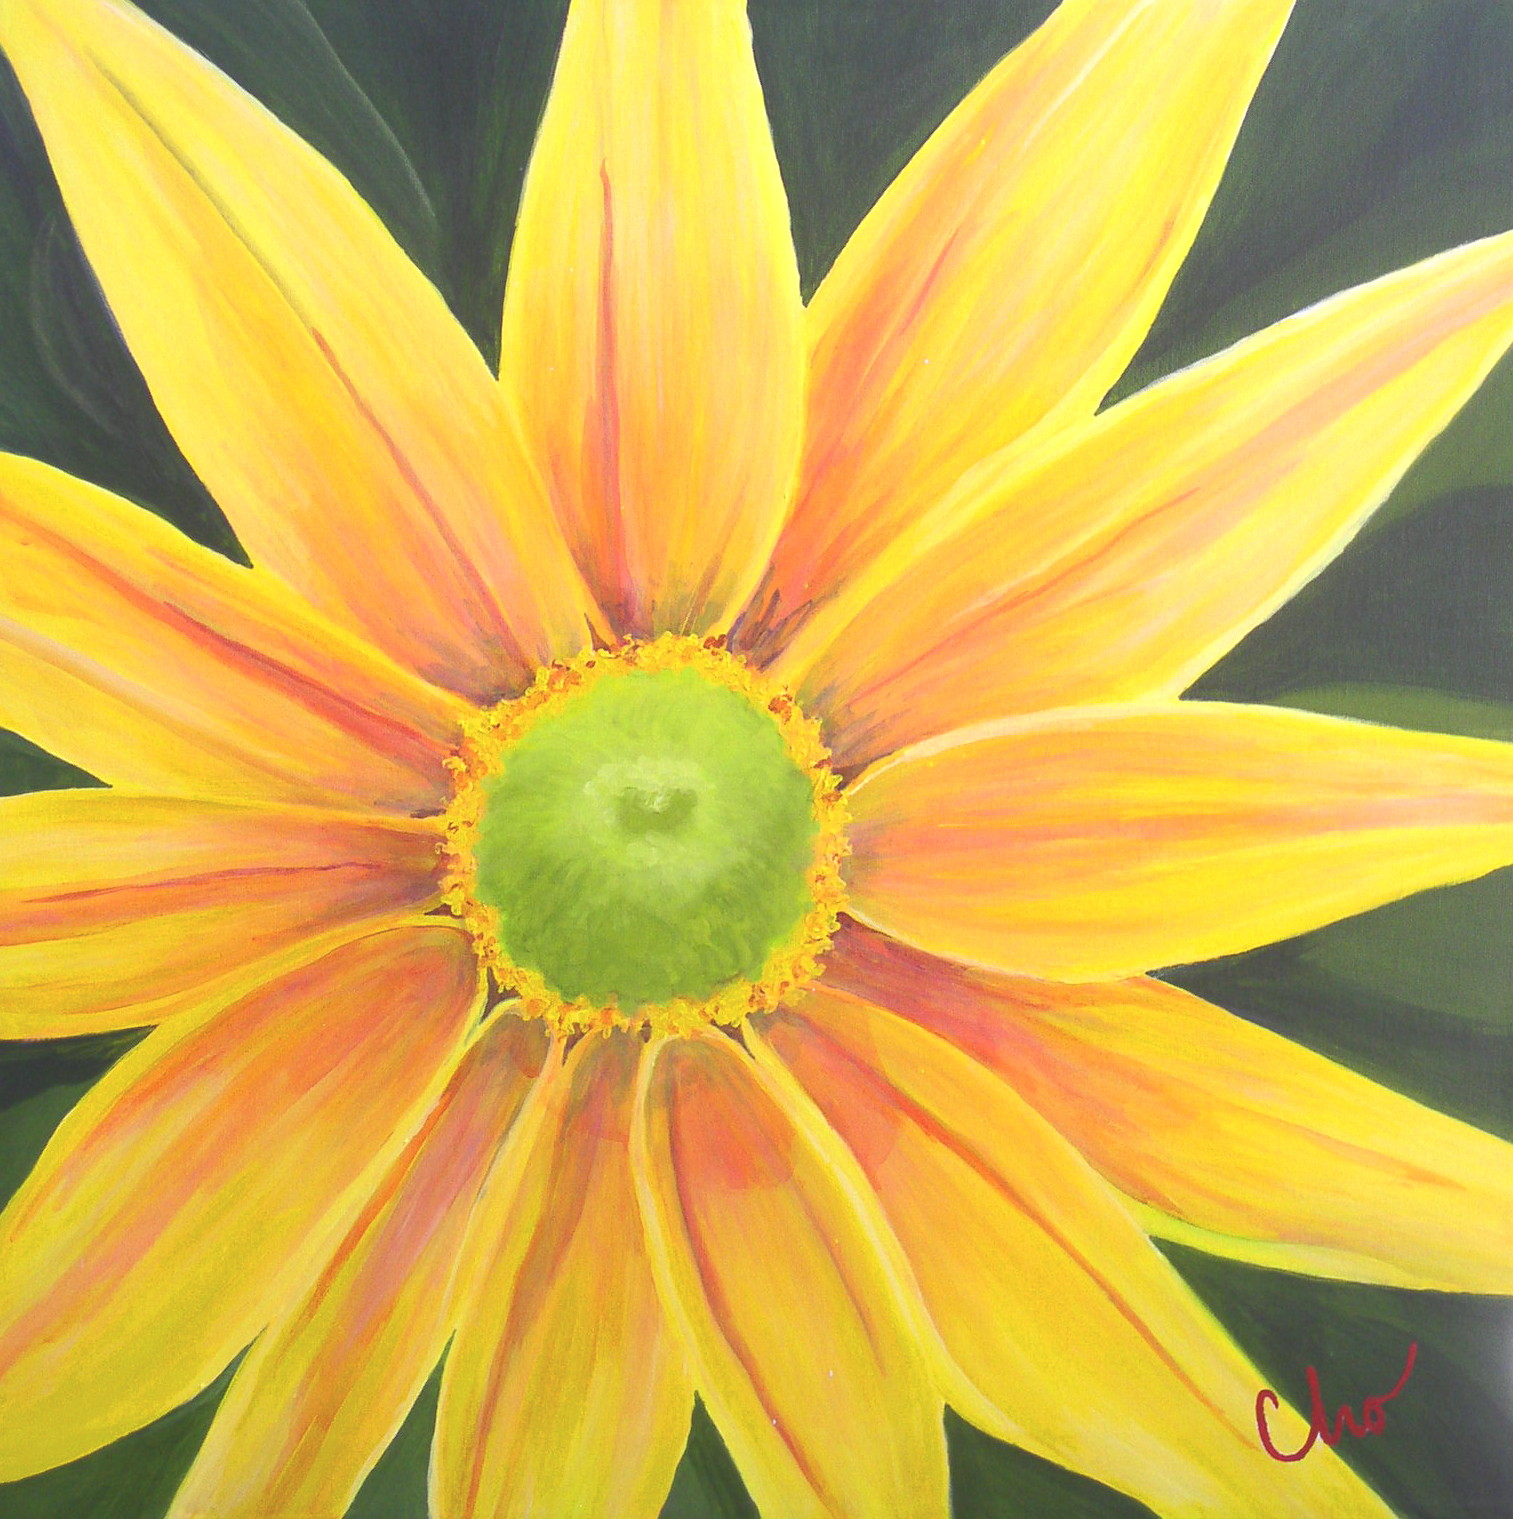 Yellow Flower 24x24 Jan09.jpg